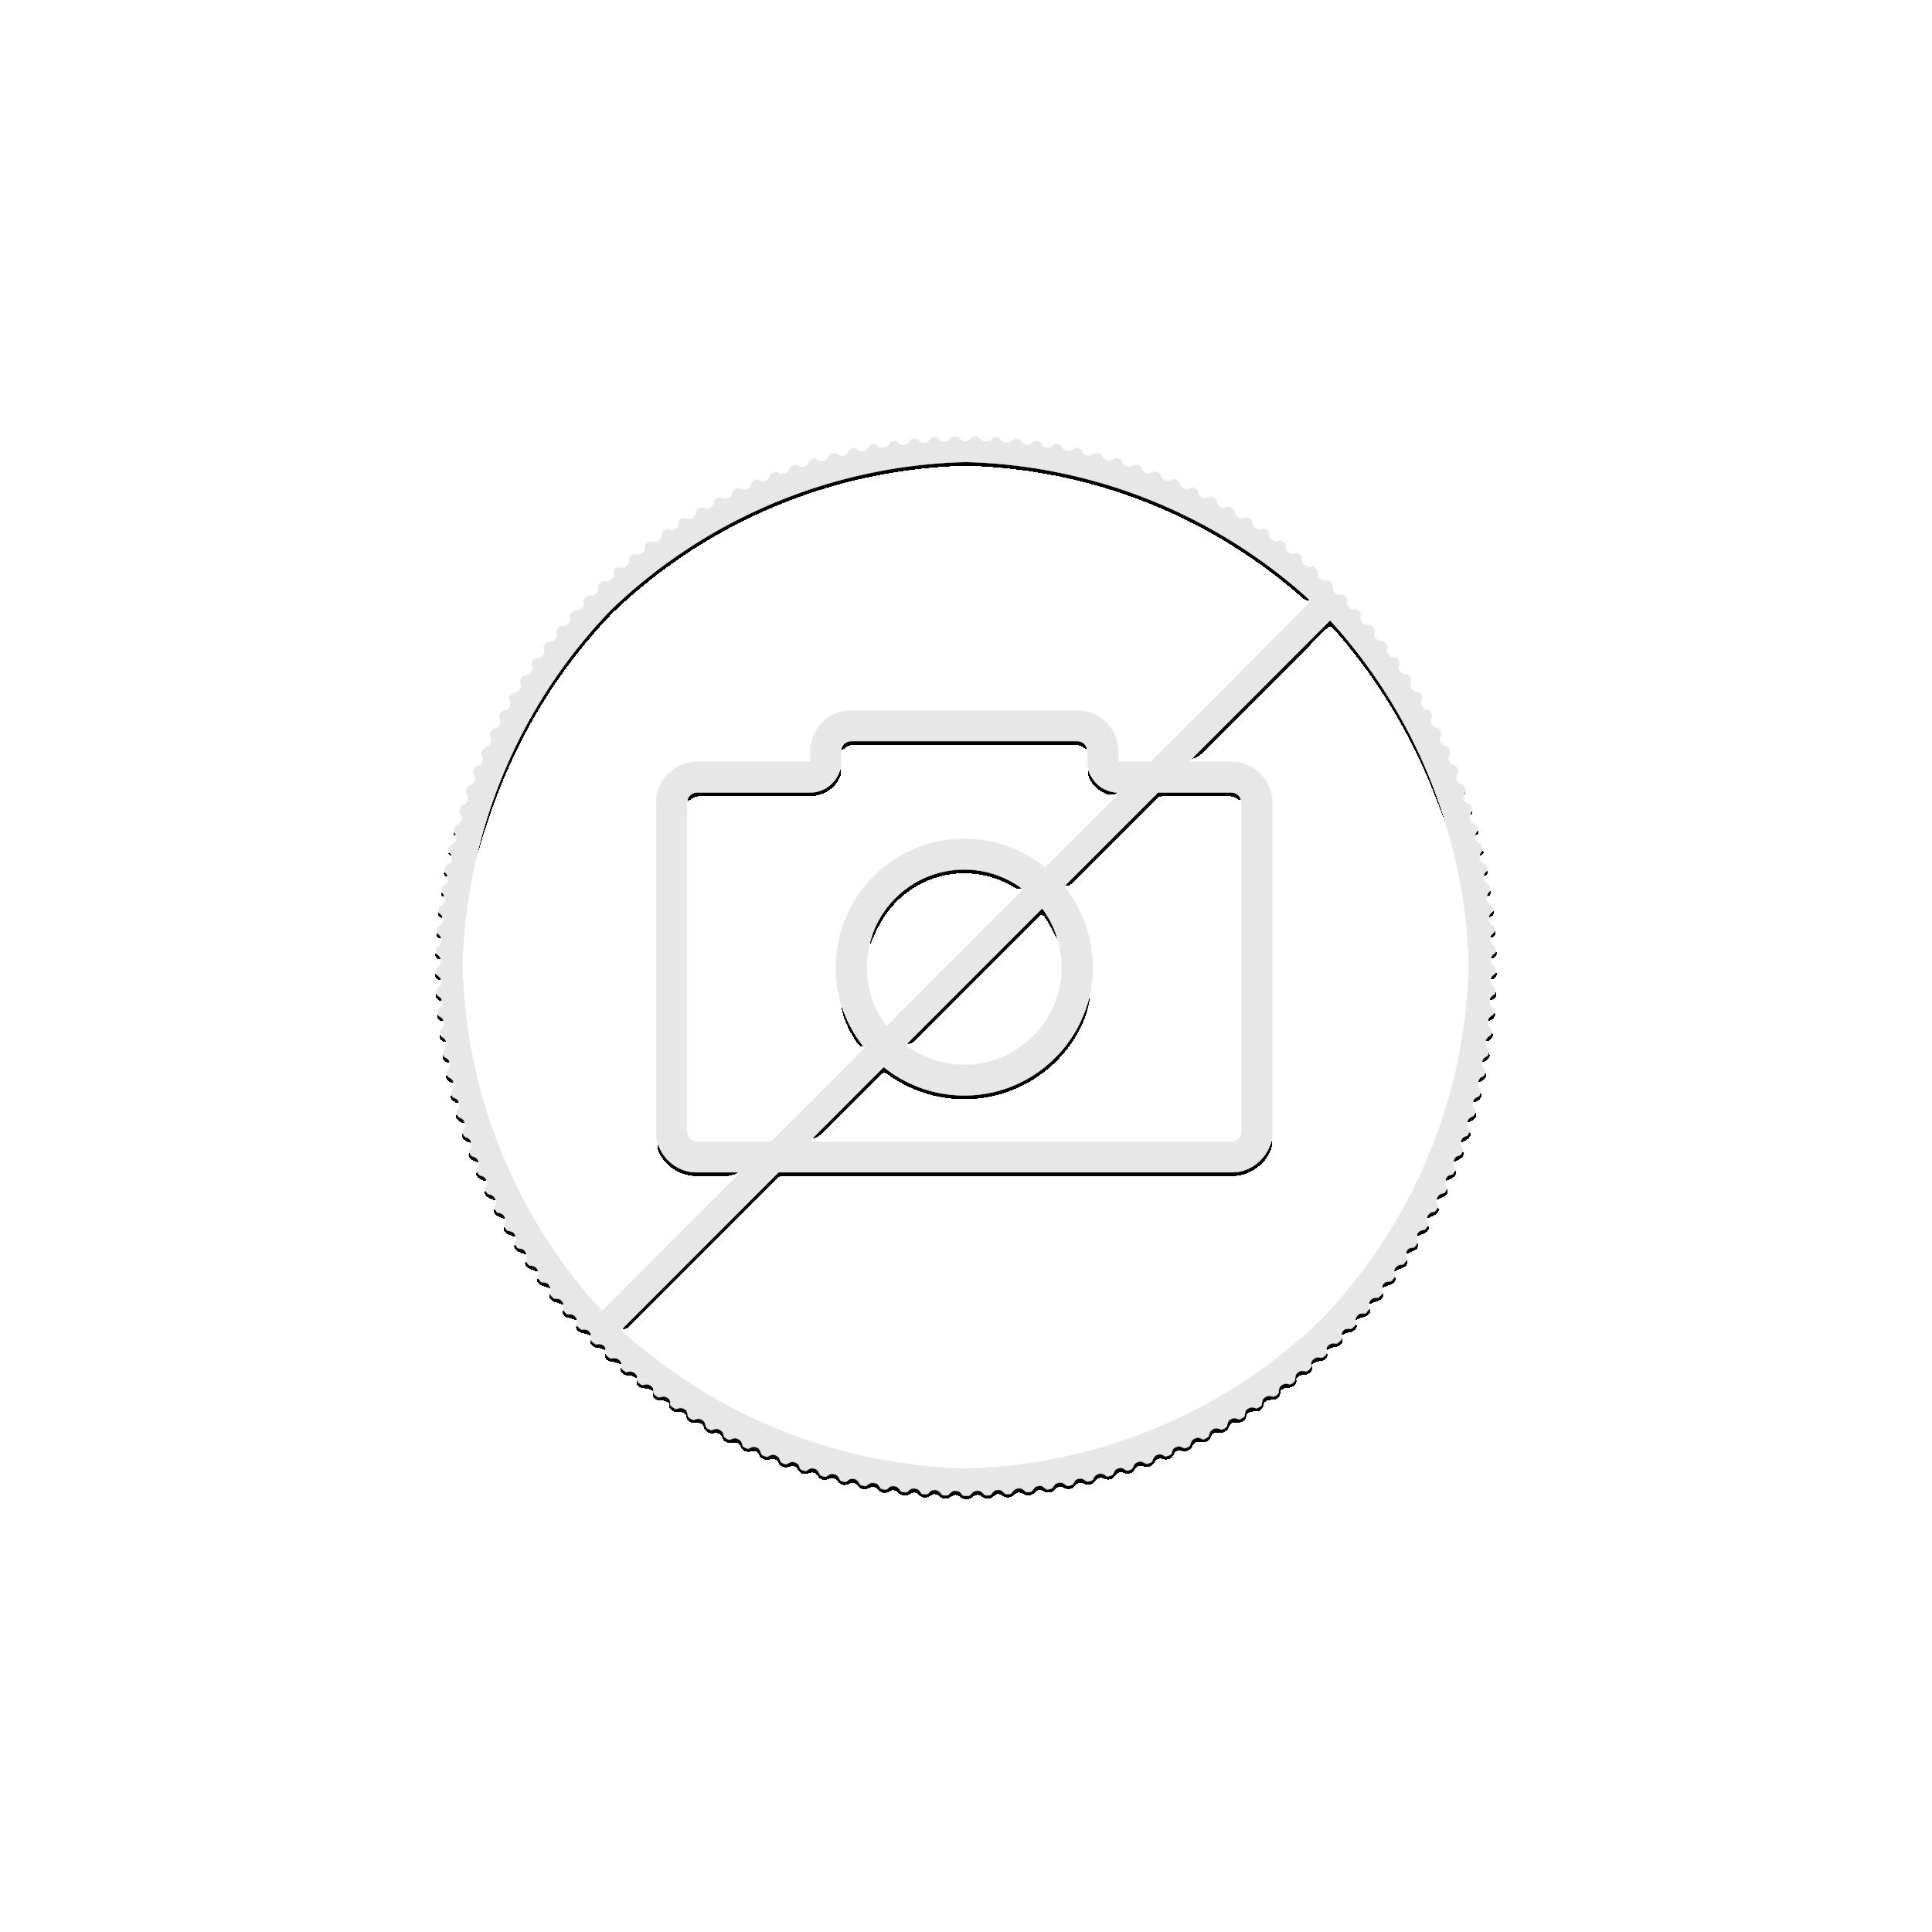 1 Kilo Kookaburra Silver Coin 1999 Buy Gold And Silver Online